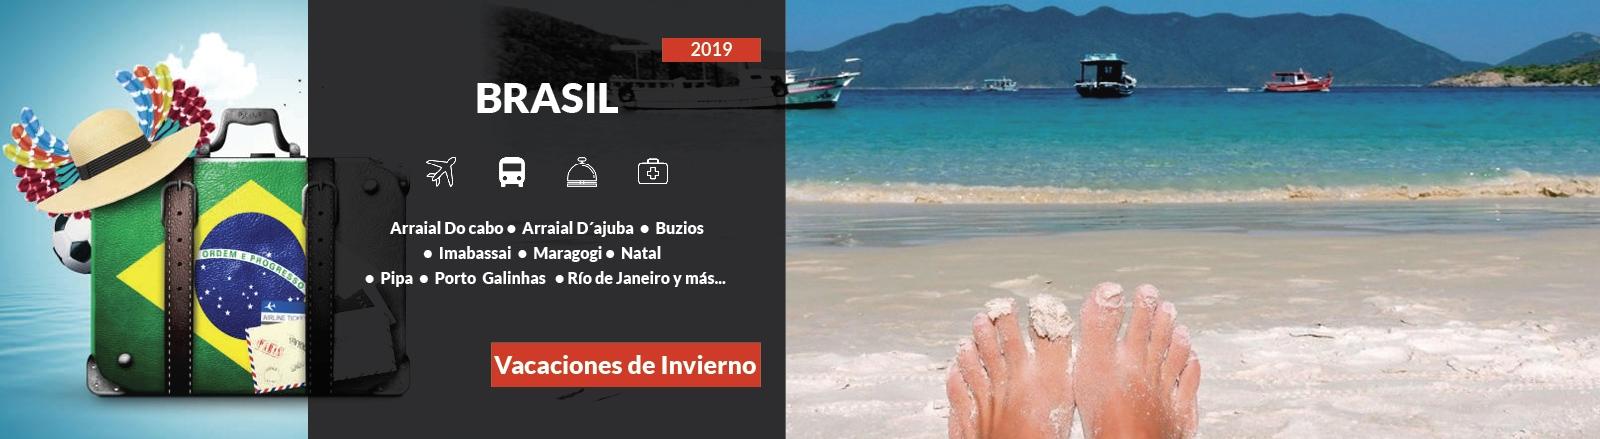 Brasil Invierno